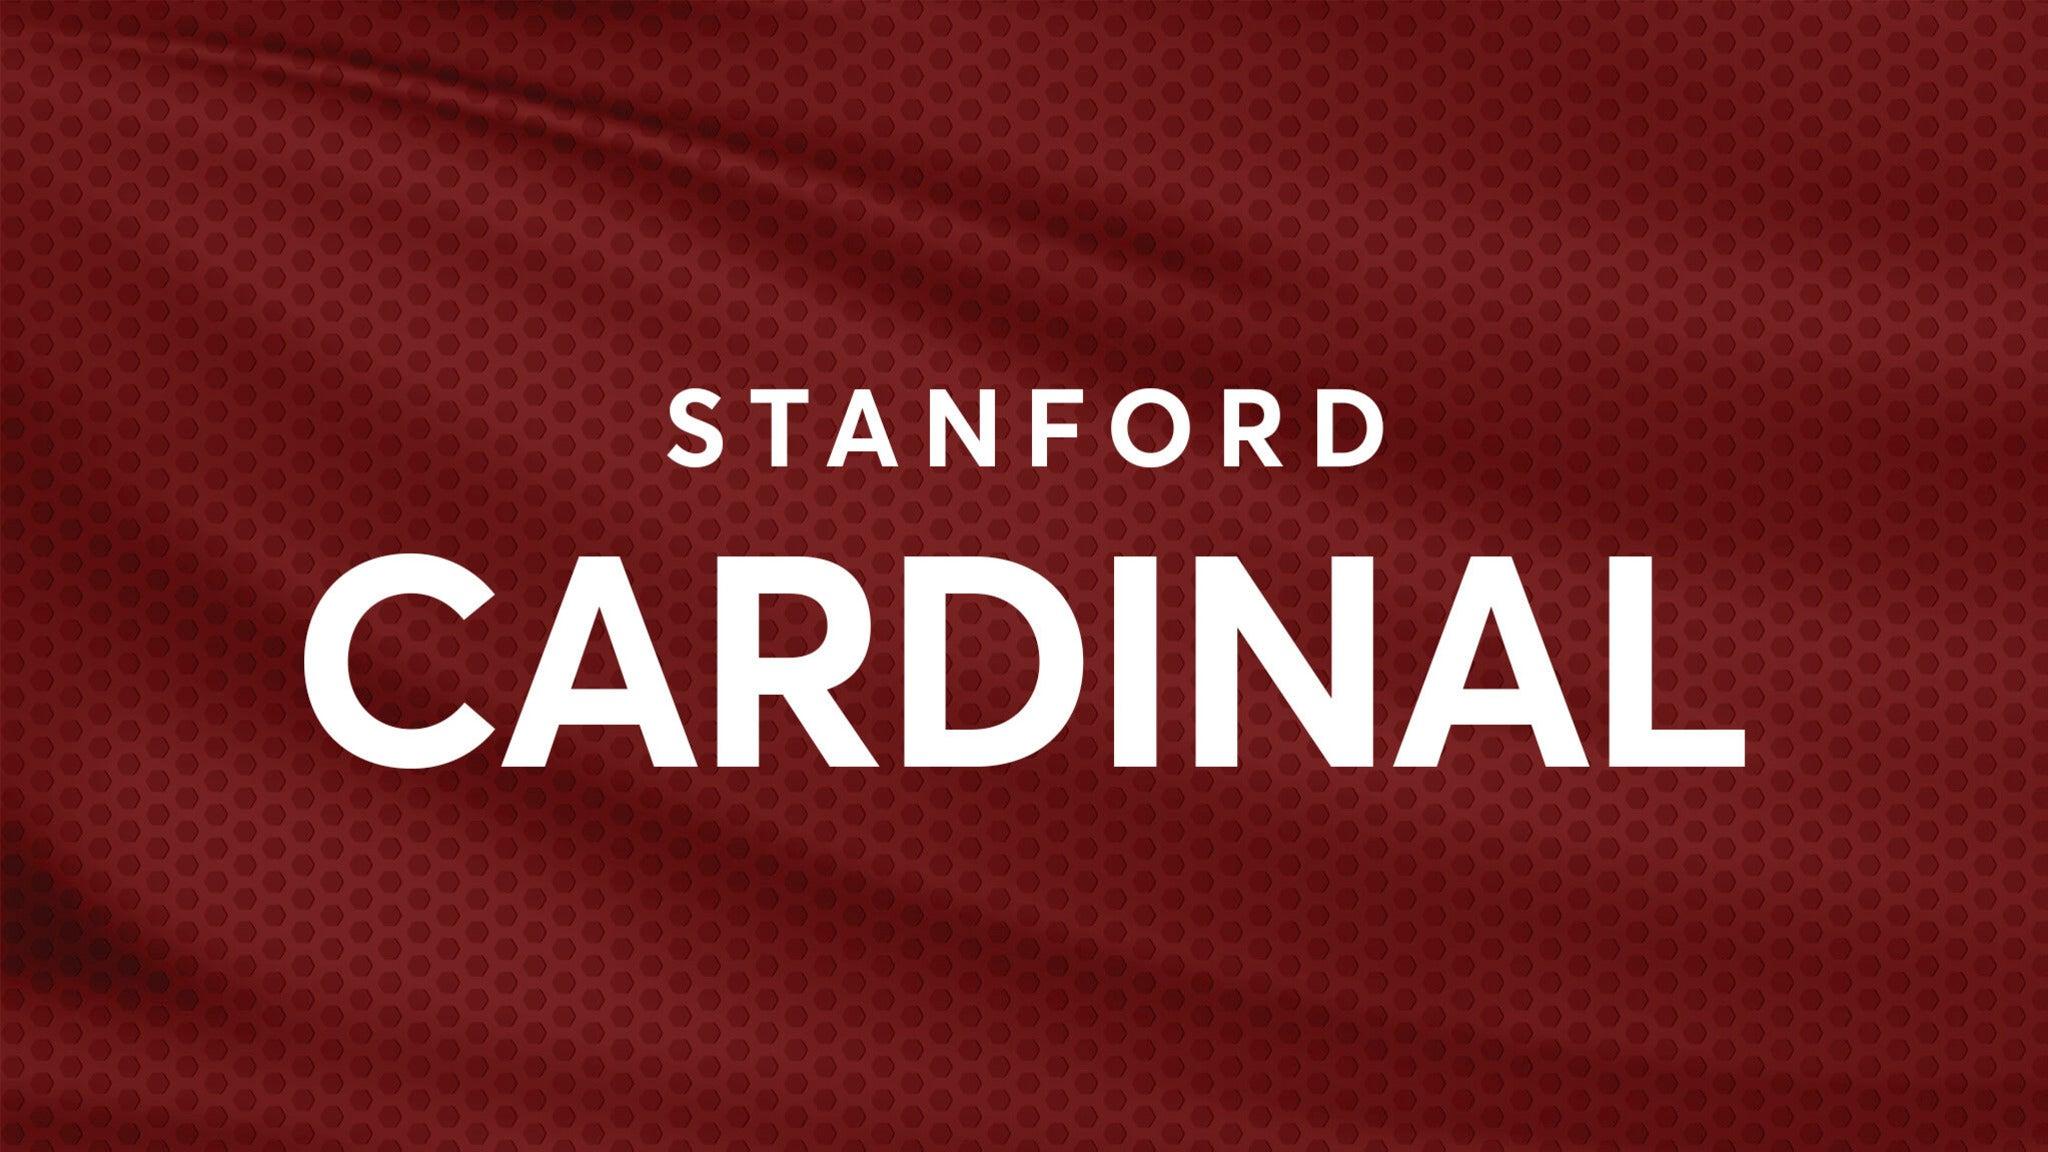 Stanford Cardinal Mens Basketball